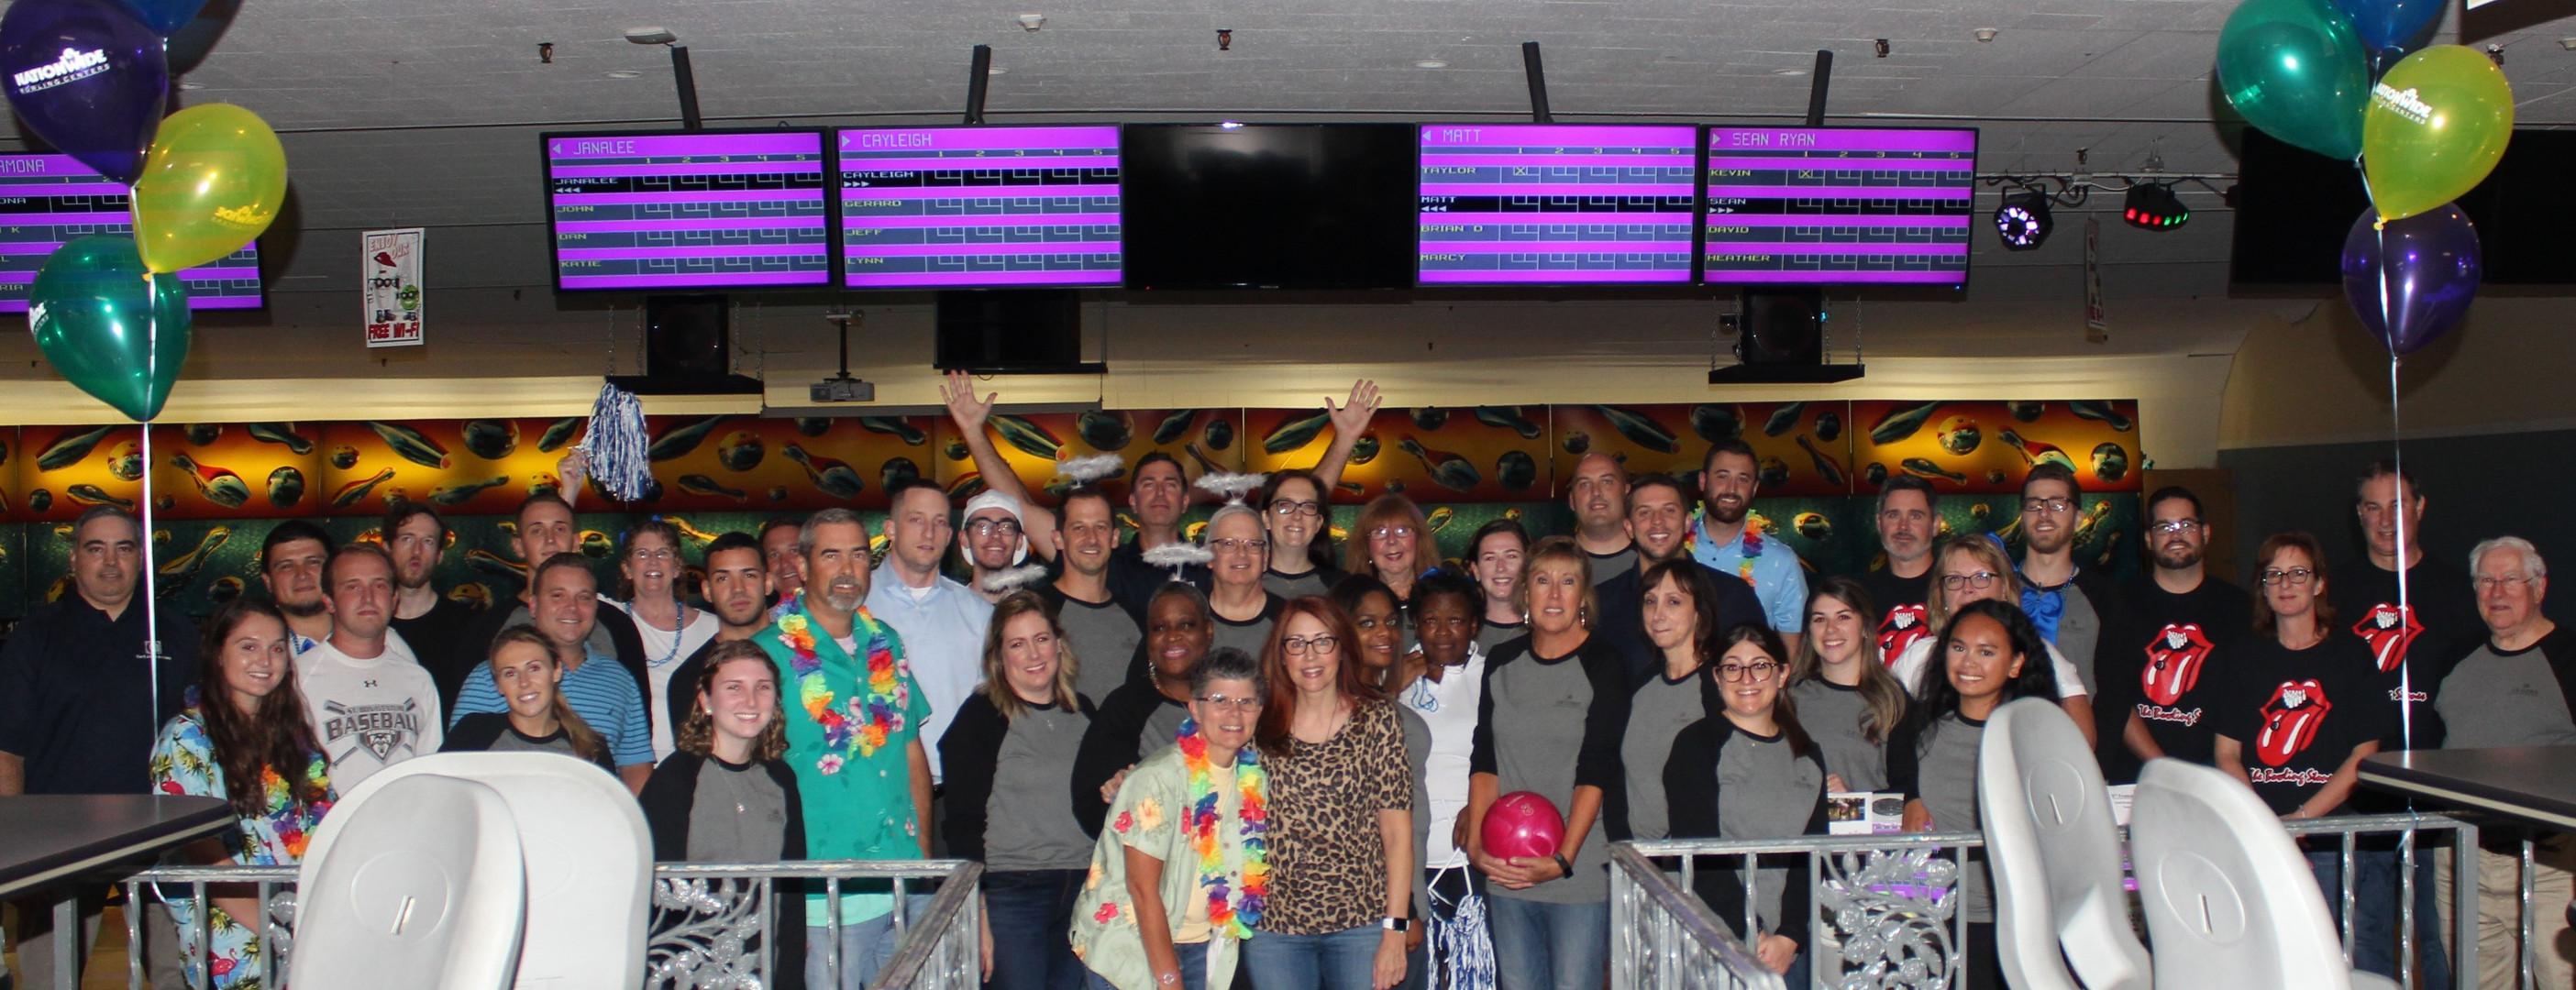 Bowling Bonanza at EBC